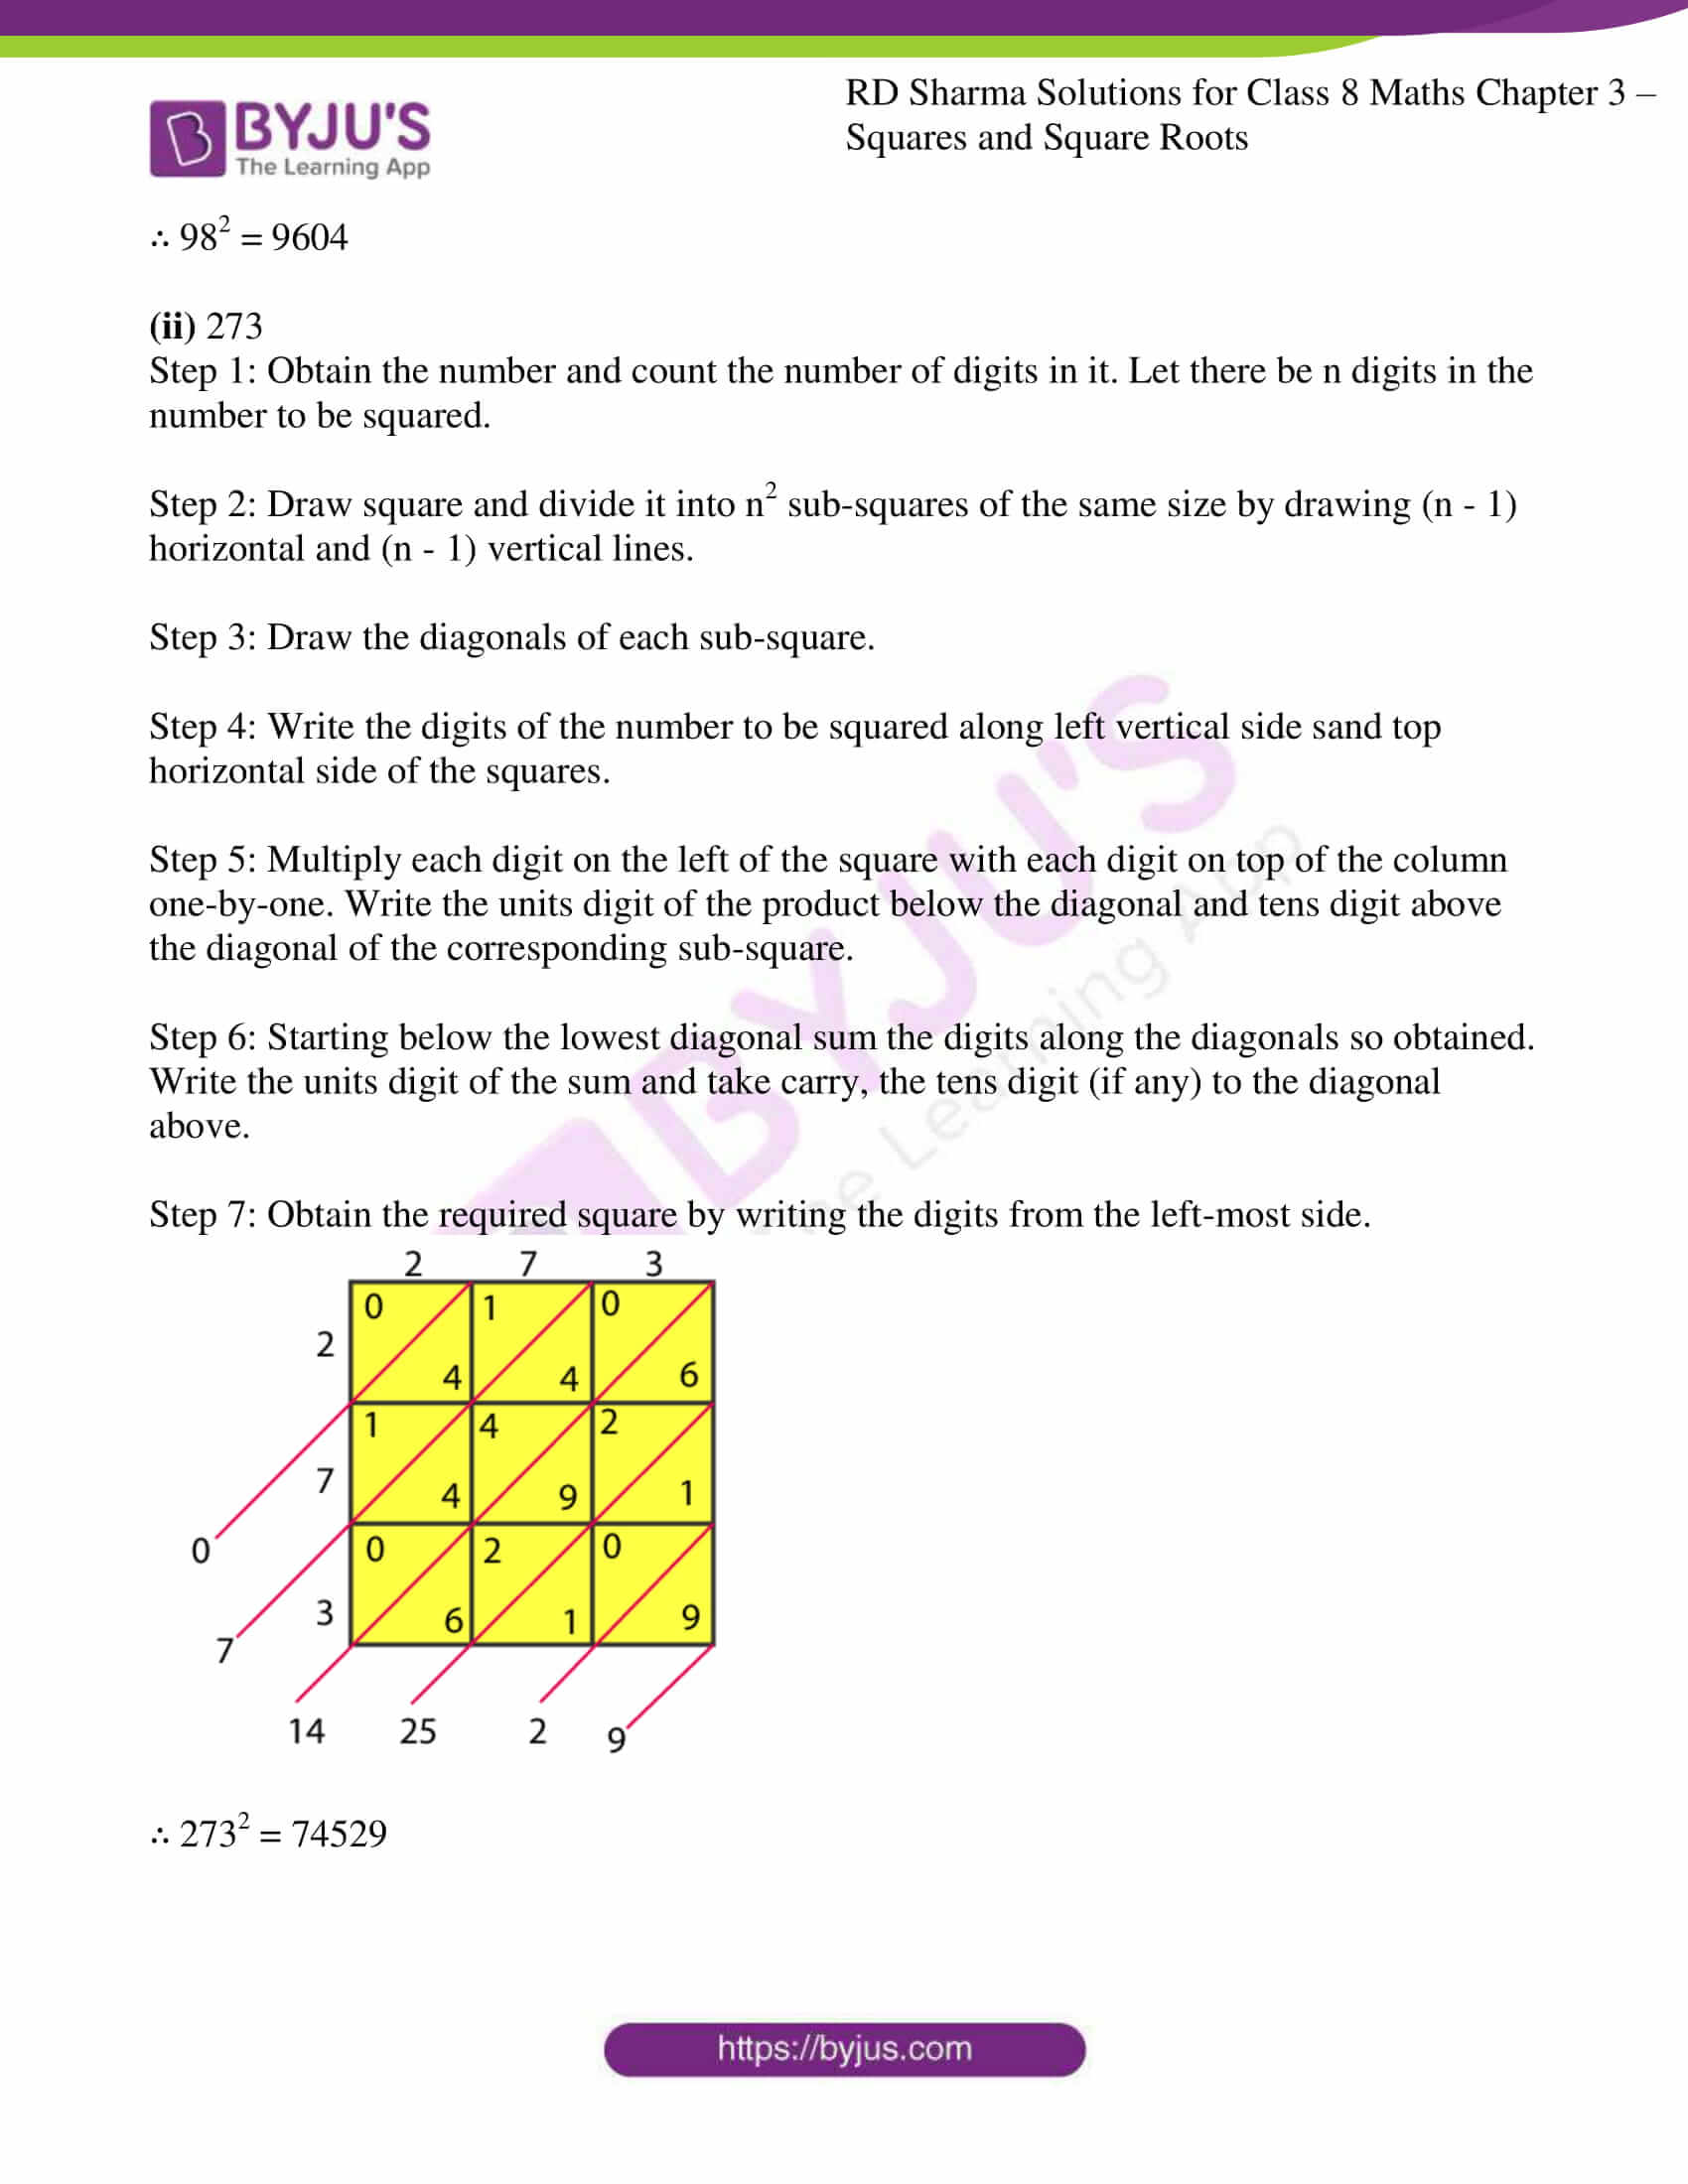 rd sharma class 8 maths chapter 3 exercise 3 04